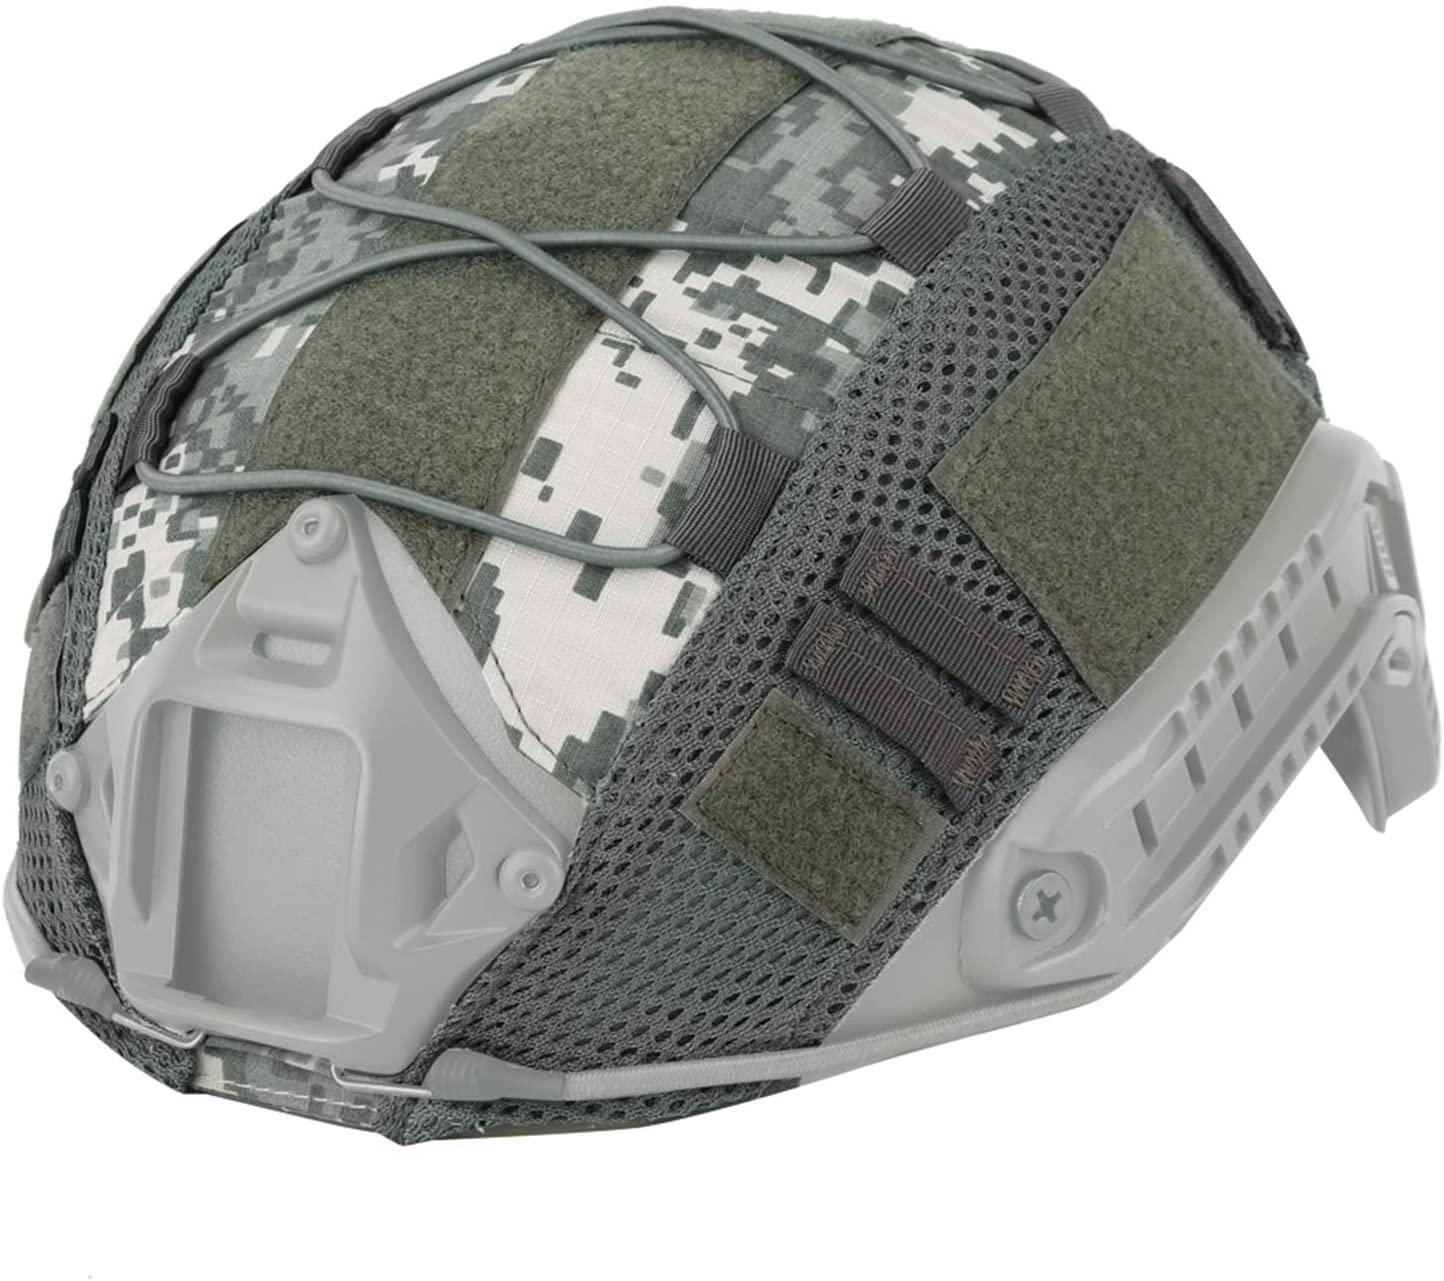 Elitezip Tactical Helmet Cover, Camouflage Military Helmet Cover with Nylon Helmet Cloth